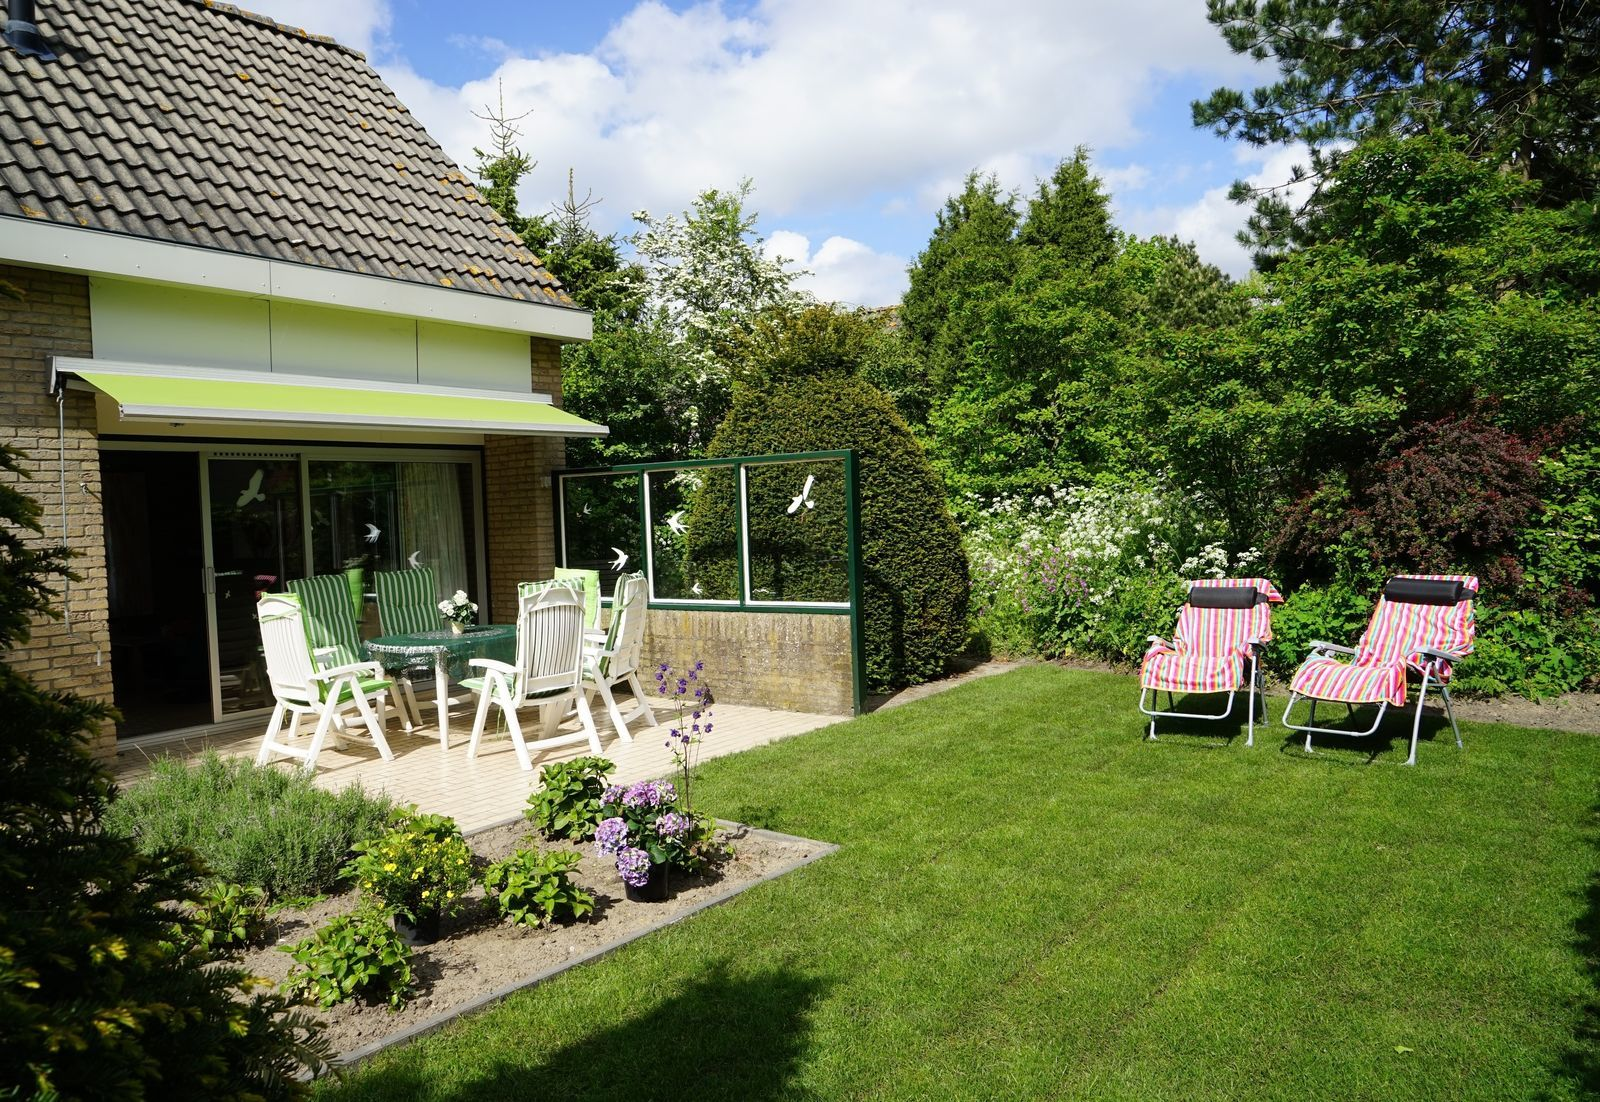 Mosselbank 016 - Noordzeepark Ouddorp